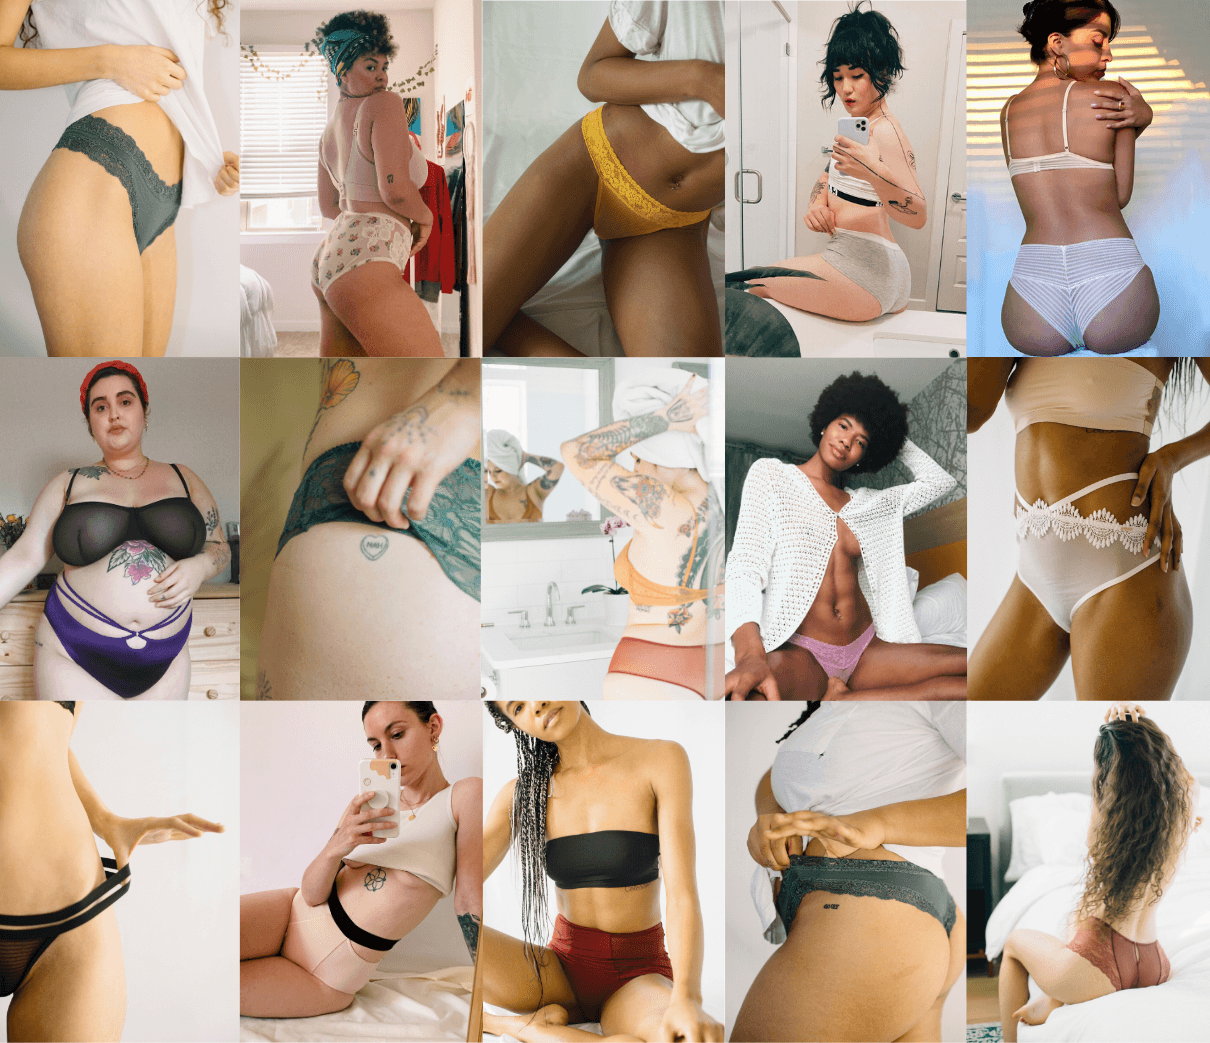 various people wearing underwear from Underclub